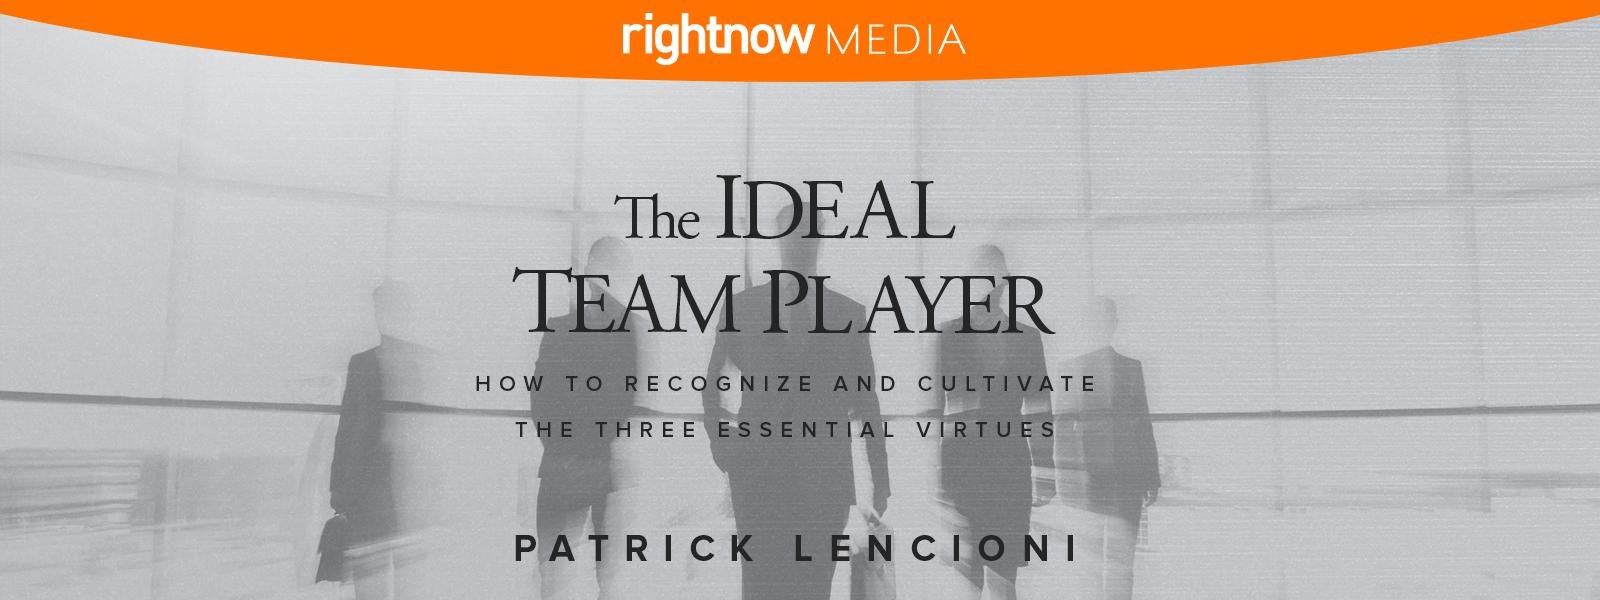 The Ideal Team Player.jpg